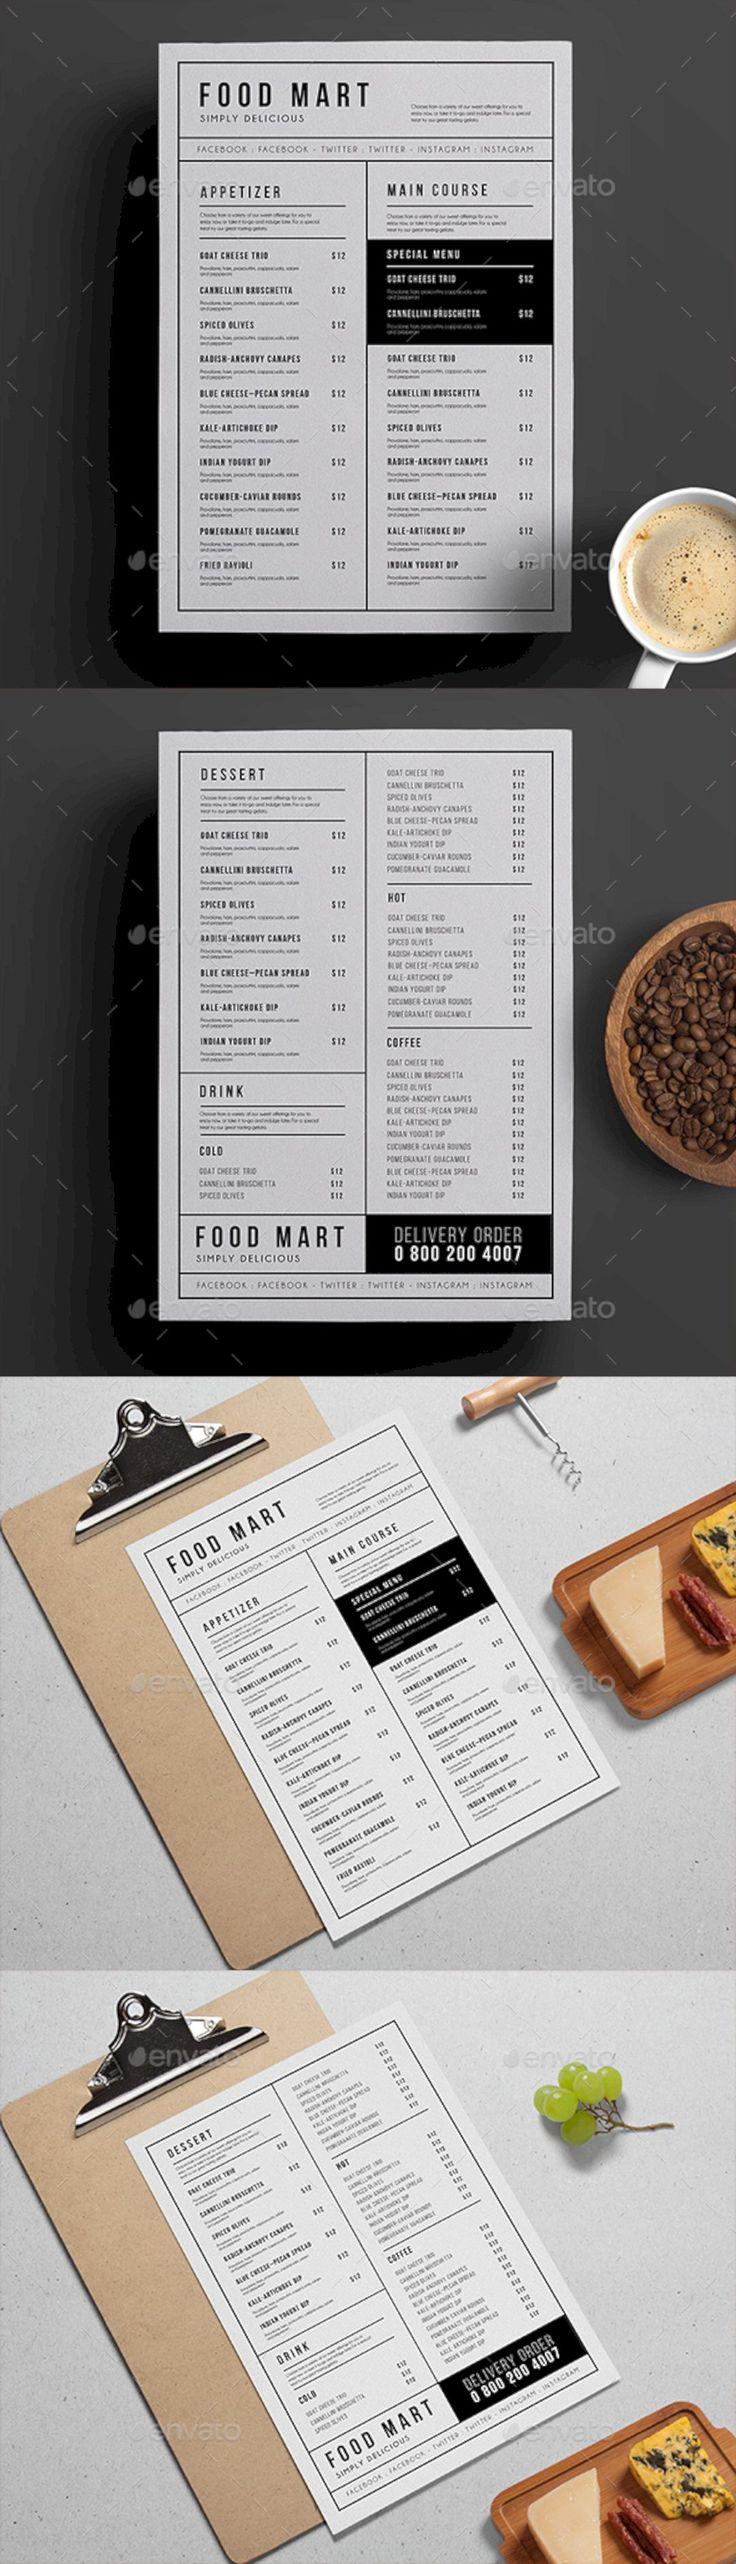 White apron menu warrington - 31 Restaurant Menu Designs